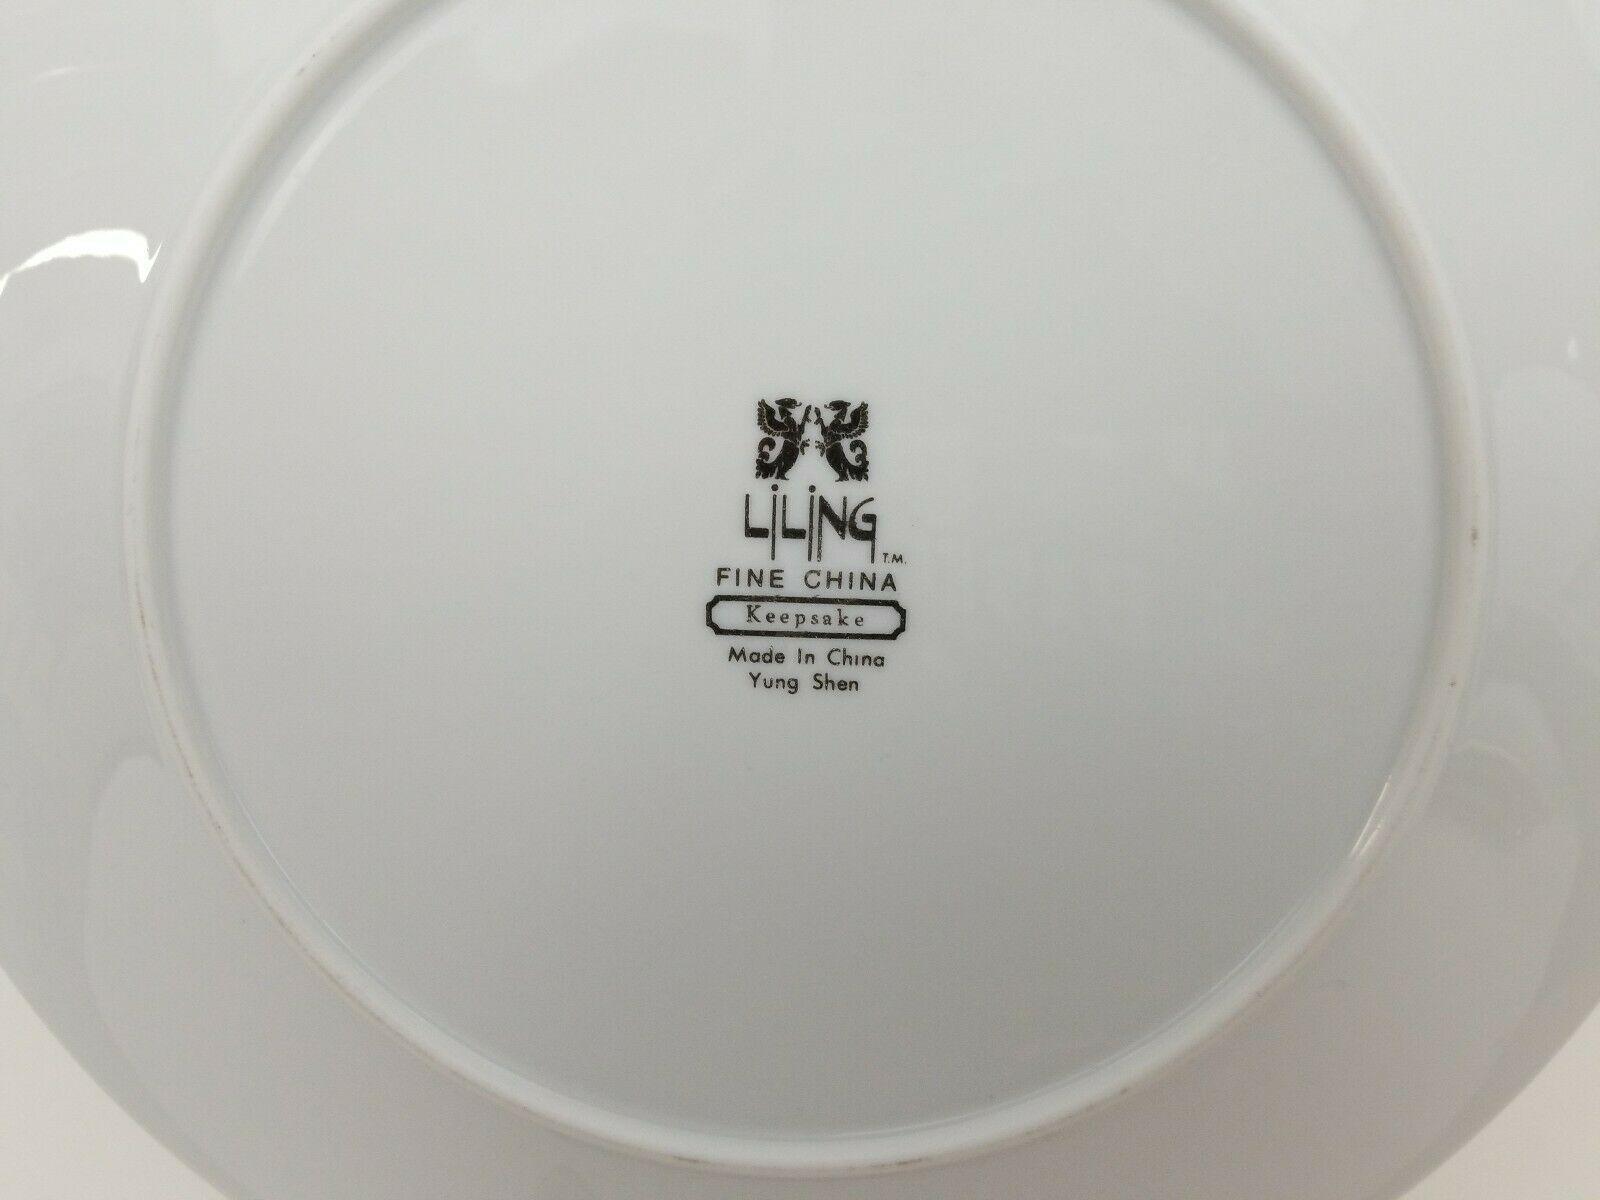 "Liling Fine China Dinner Plates Set of 4 Yung Shen White Roses Keepsake 10 5/8"" image 4"